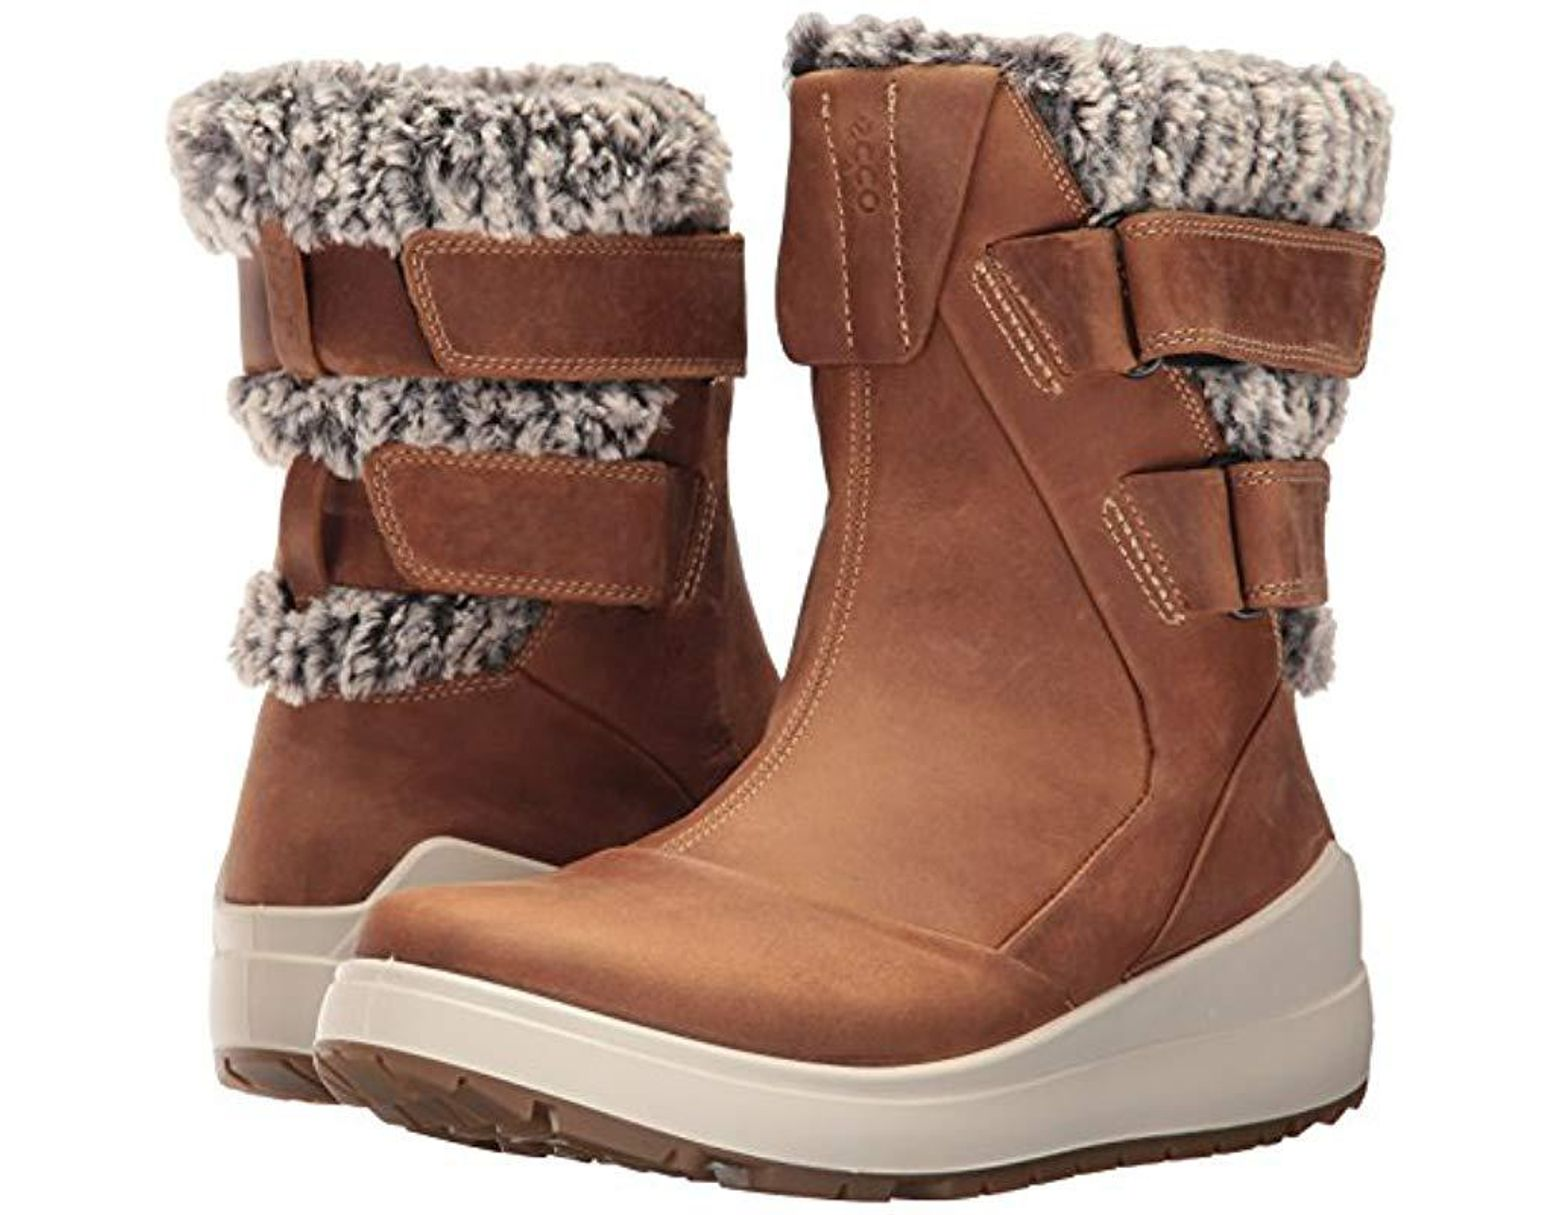 b92f3ac315 Women's Wo Winter Boots Brown Noyce 834613/02291